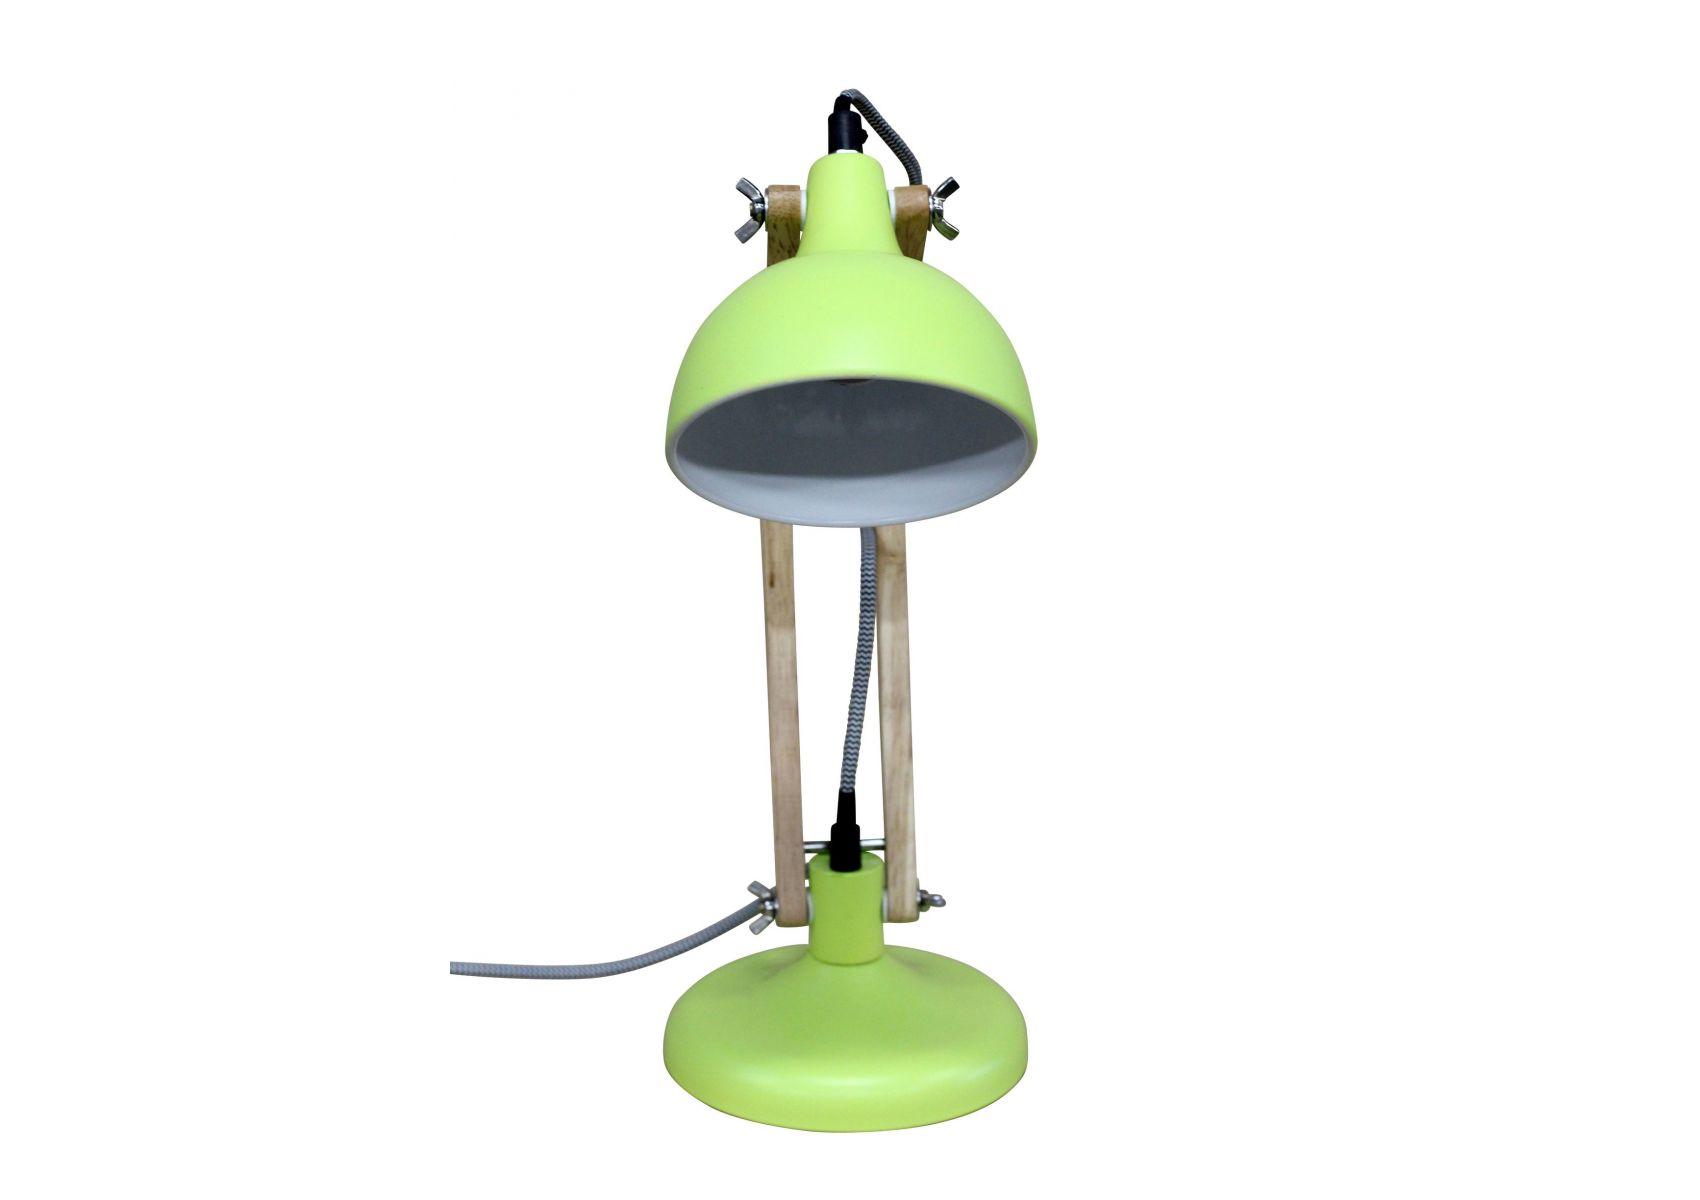 Bureau Lampe Bois En Mini De Articulé Redcartel Dexter vnN8wm0